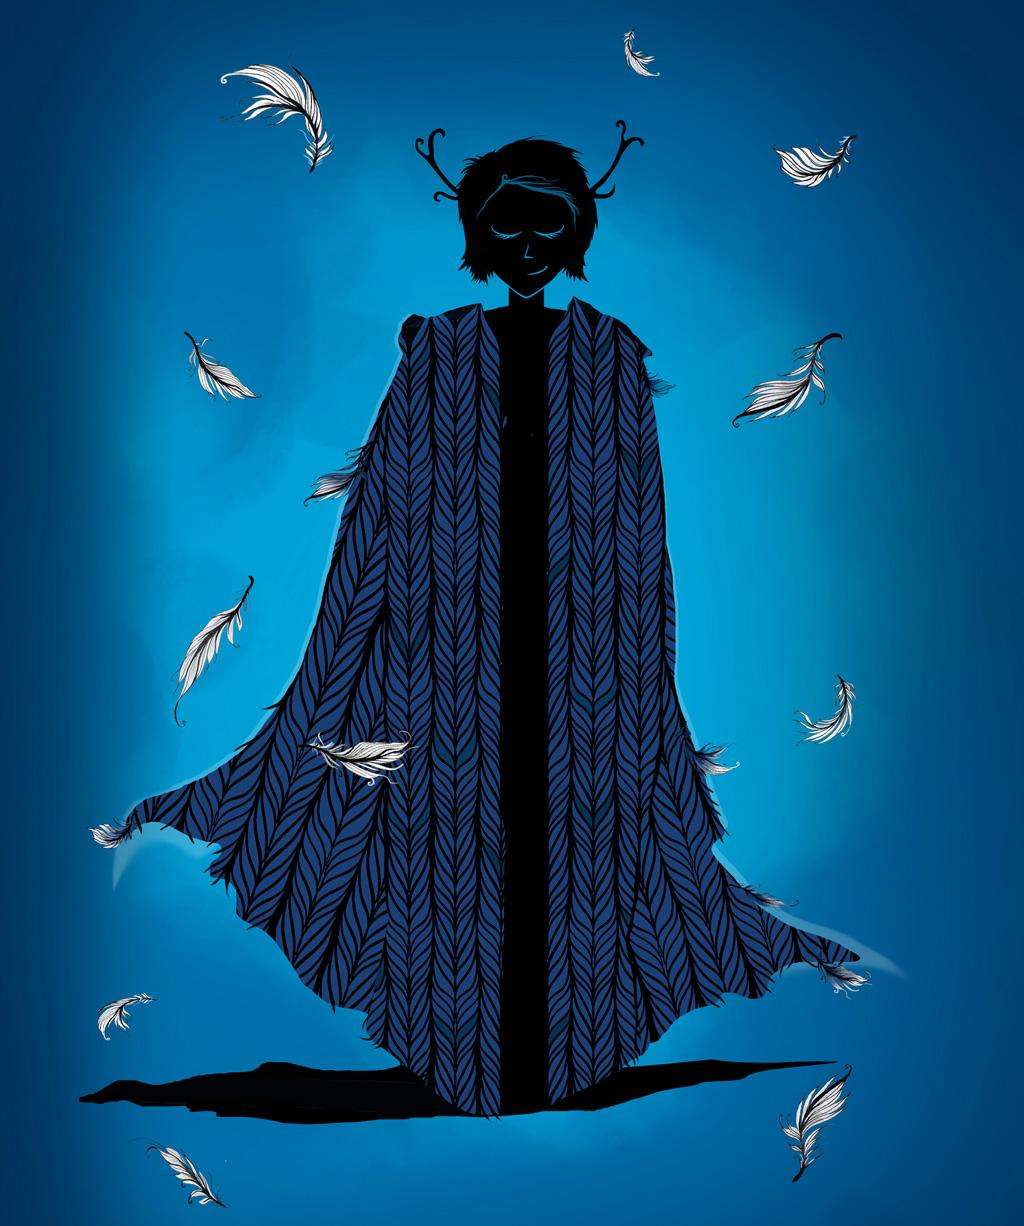 cloak of feathers illustration.jpg